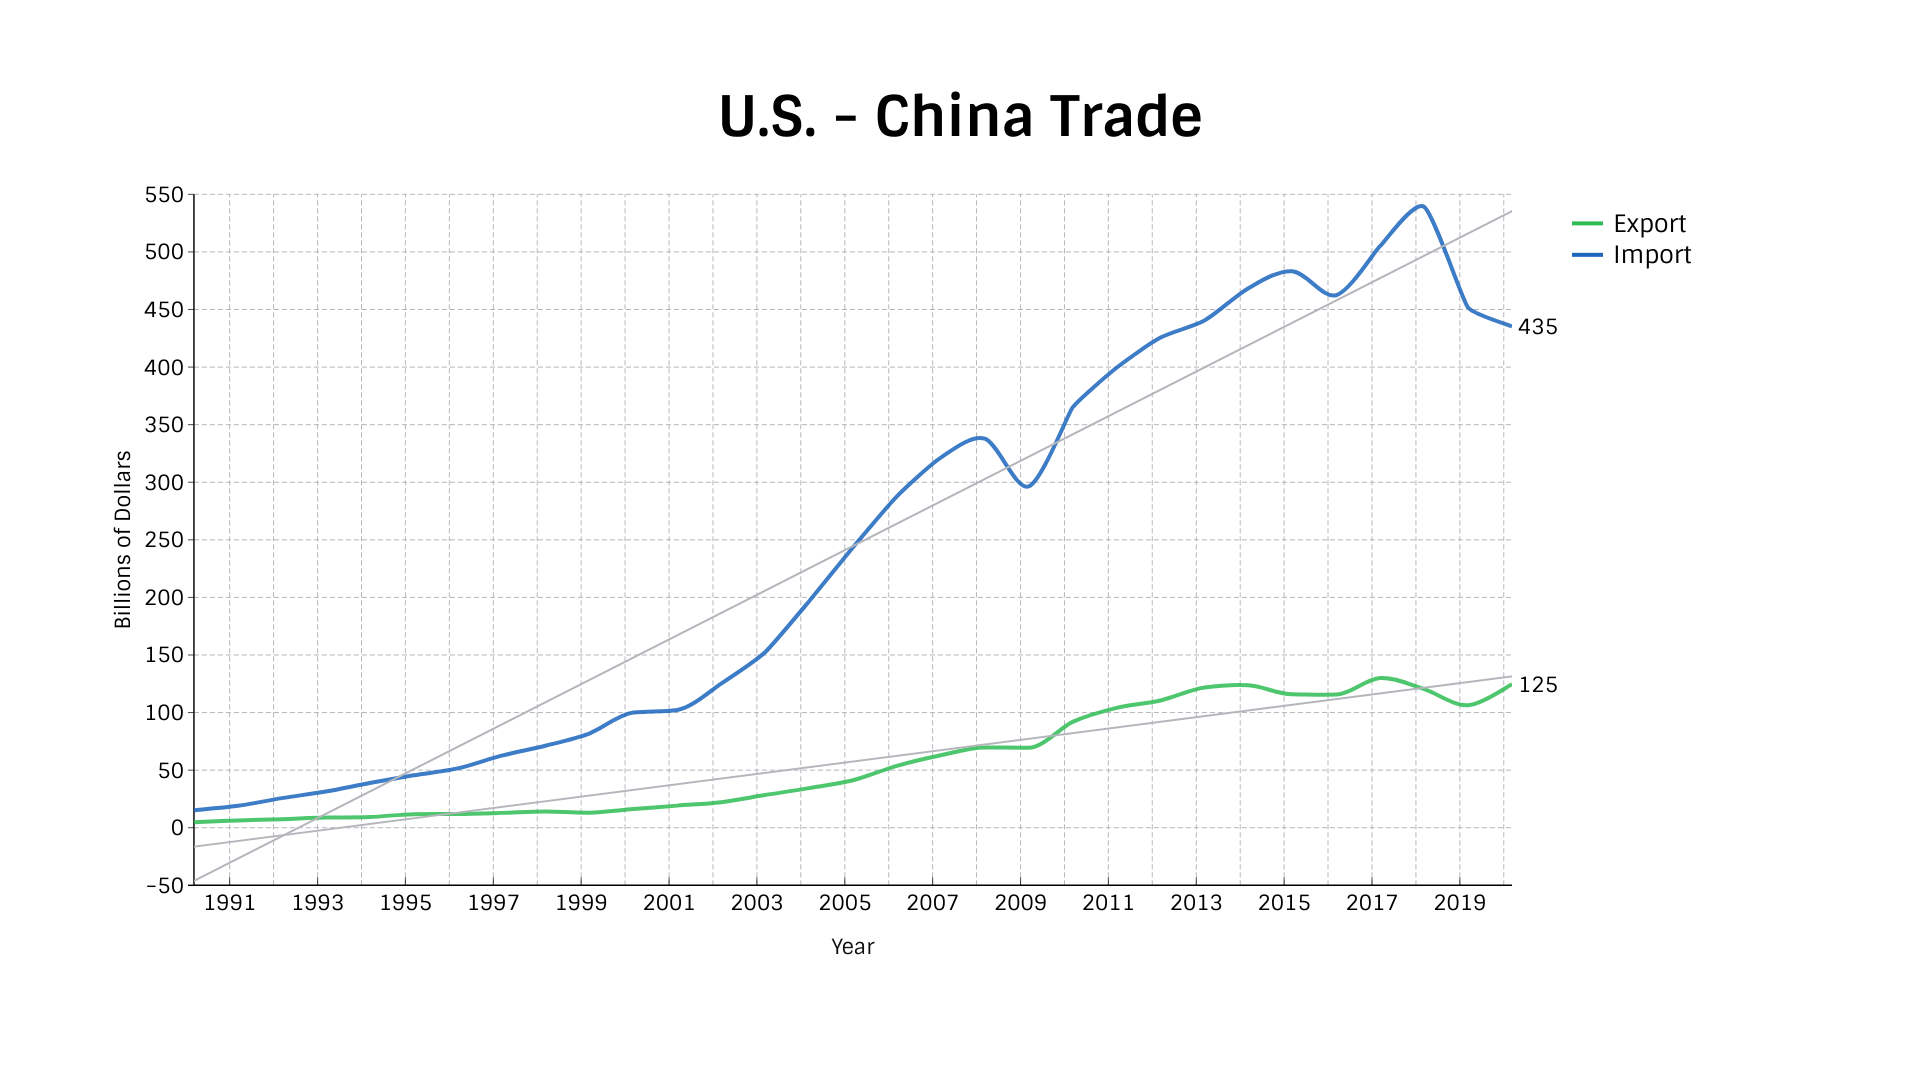 U.S. - China Trade 1991-2020